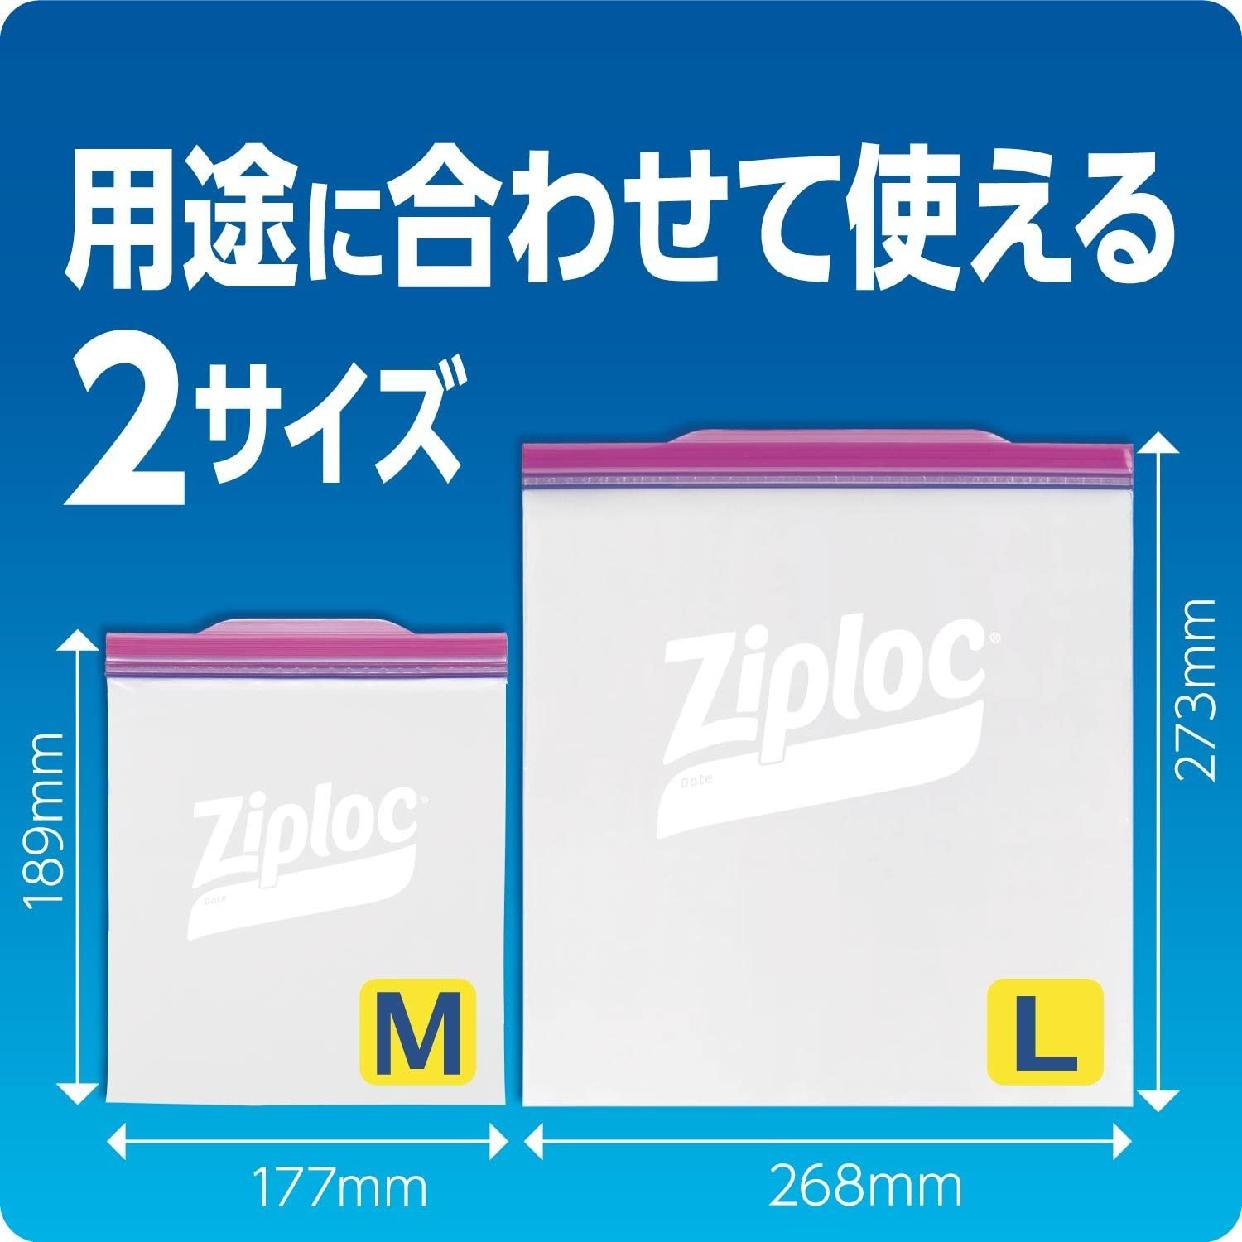 Ziploc(ジップロック) ストックバッグ Mサイズの商品画像3